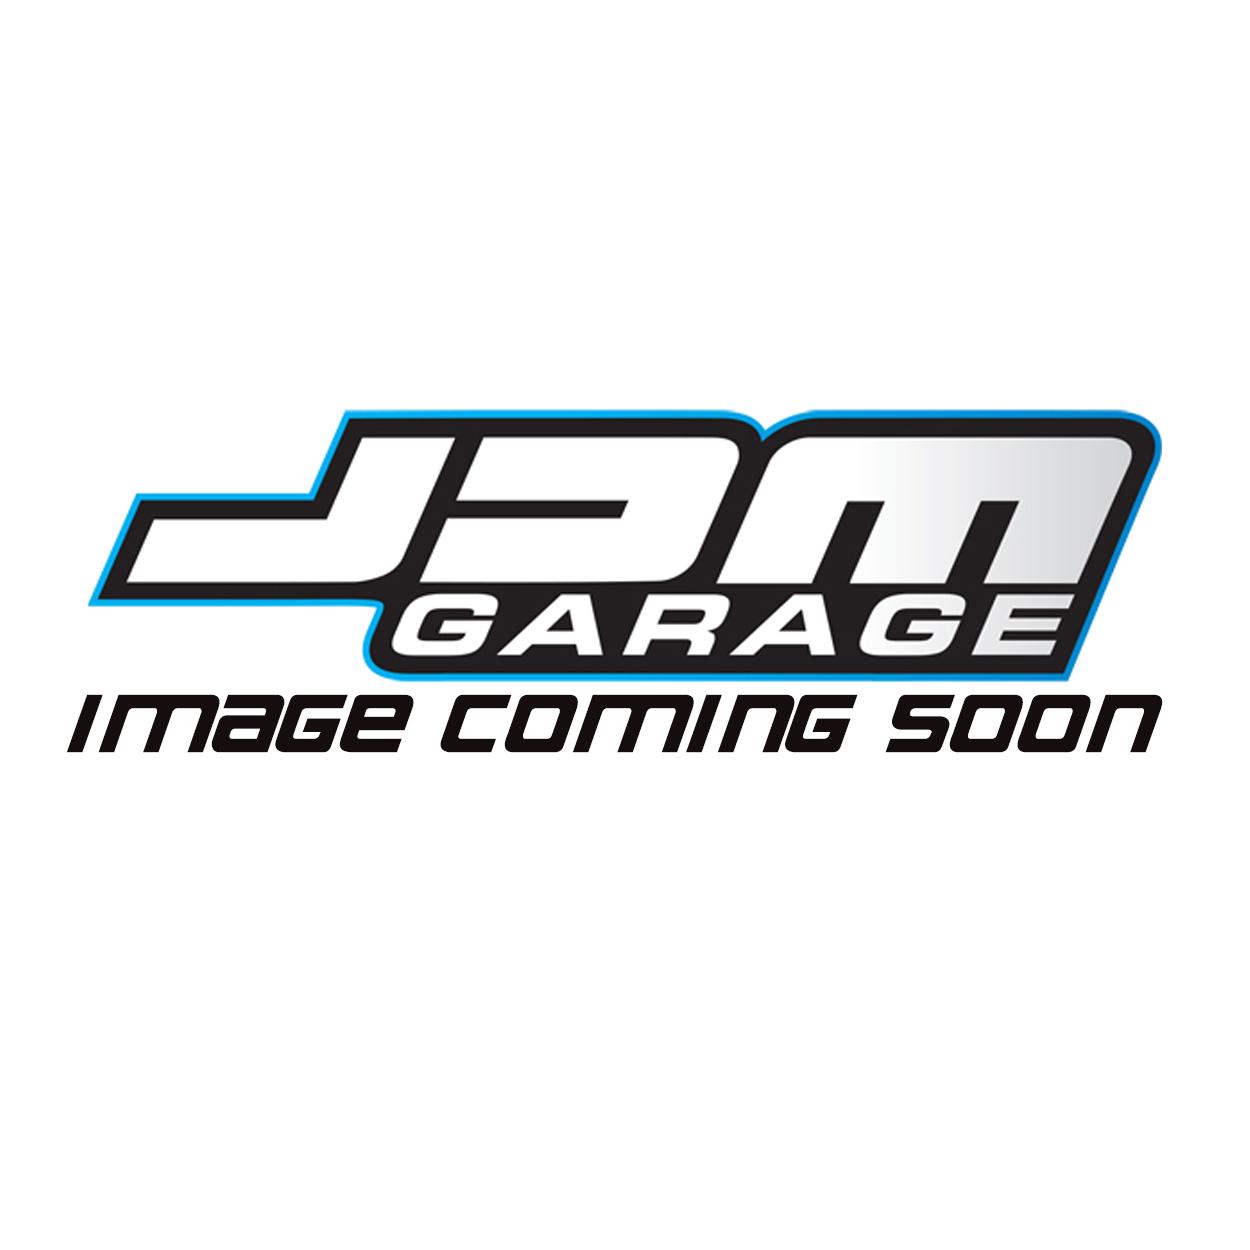 Genuine Nissan Brake Line Firewall Clamp Clip For Nissan Skyline R32 GTS GTST GTS-4 GTR ABS 46289-72L00